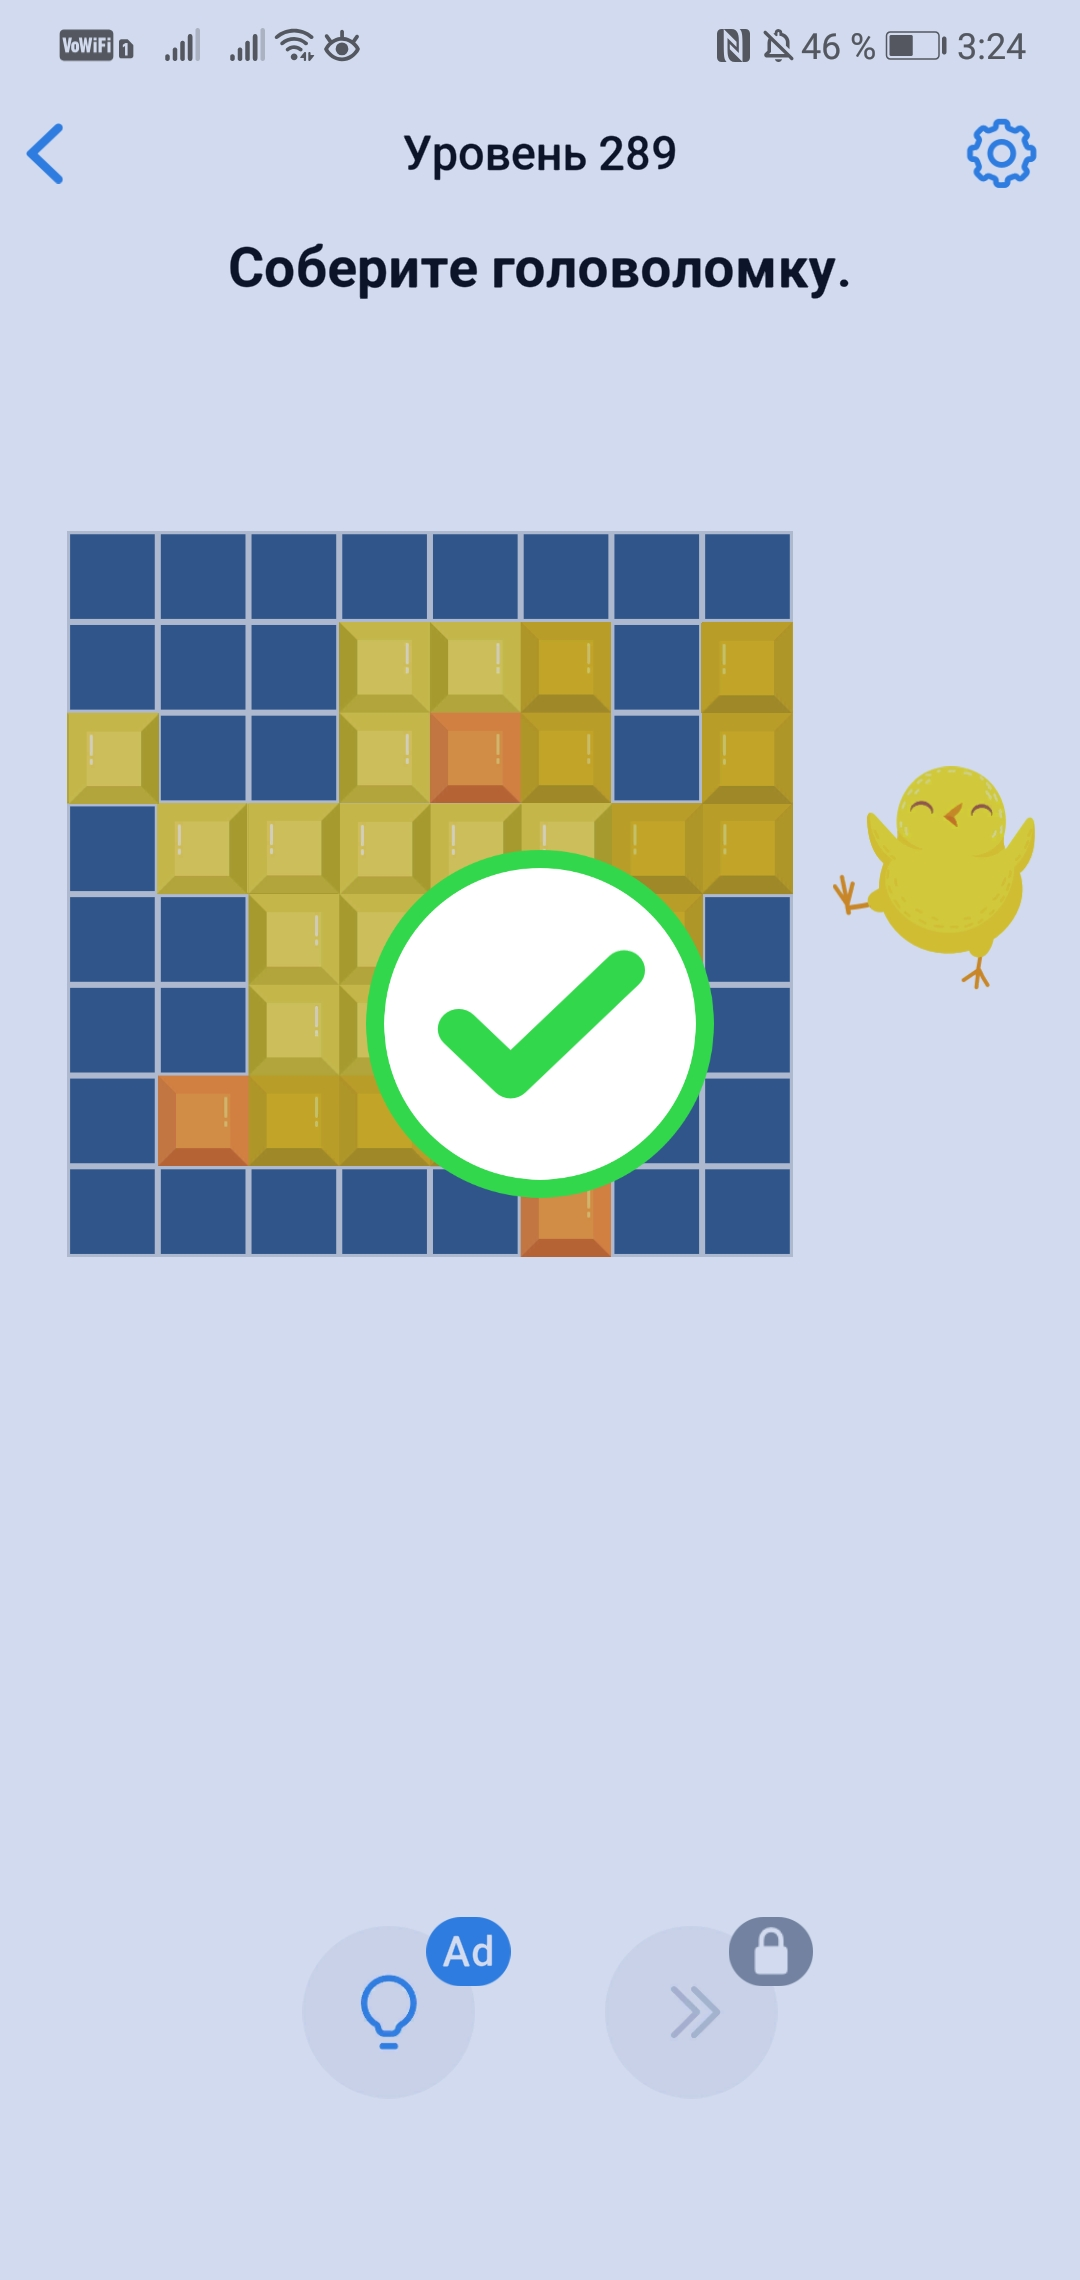 Easy Game - 289 уровень - Соберите головоломку.